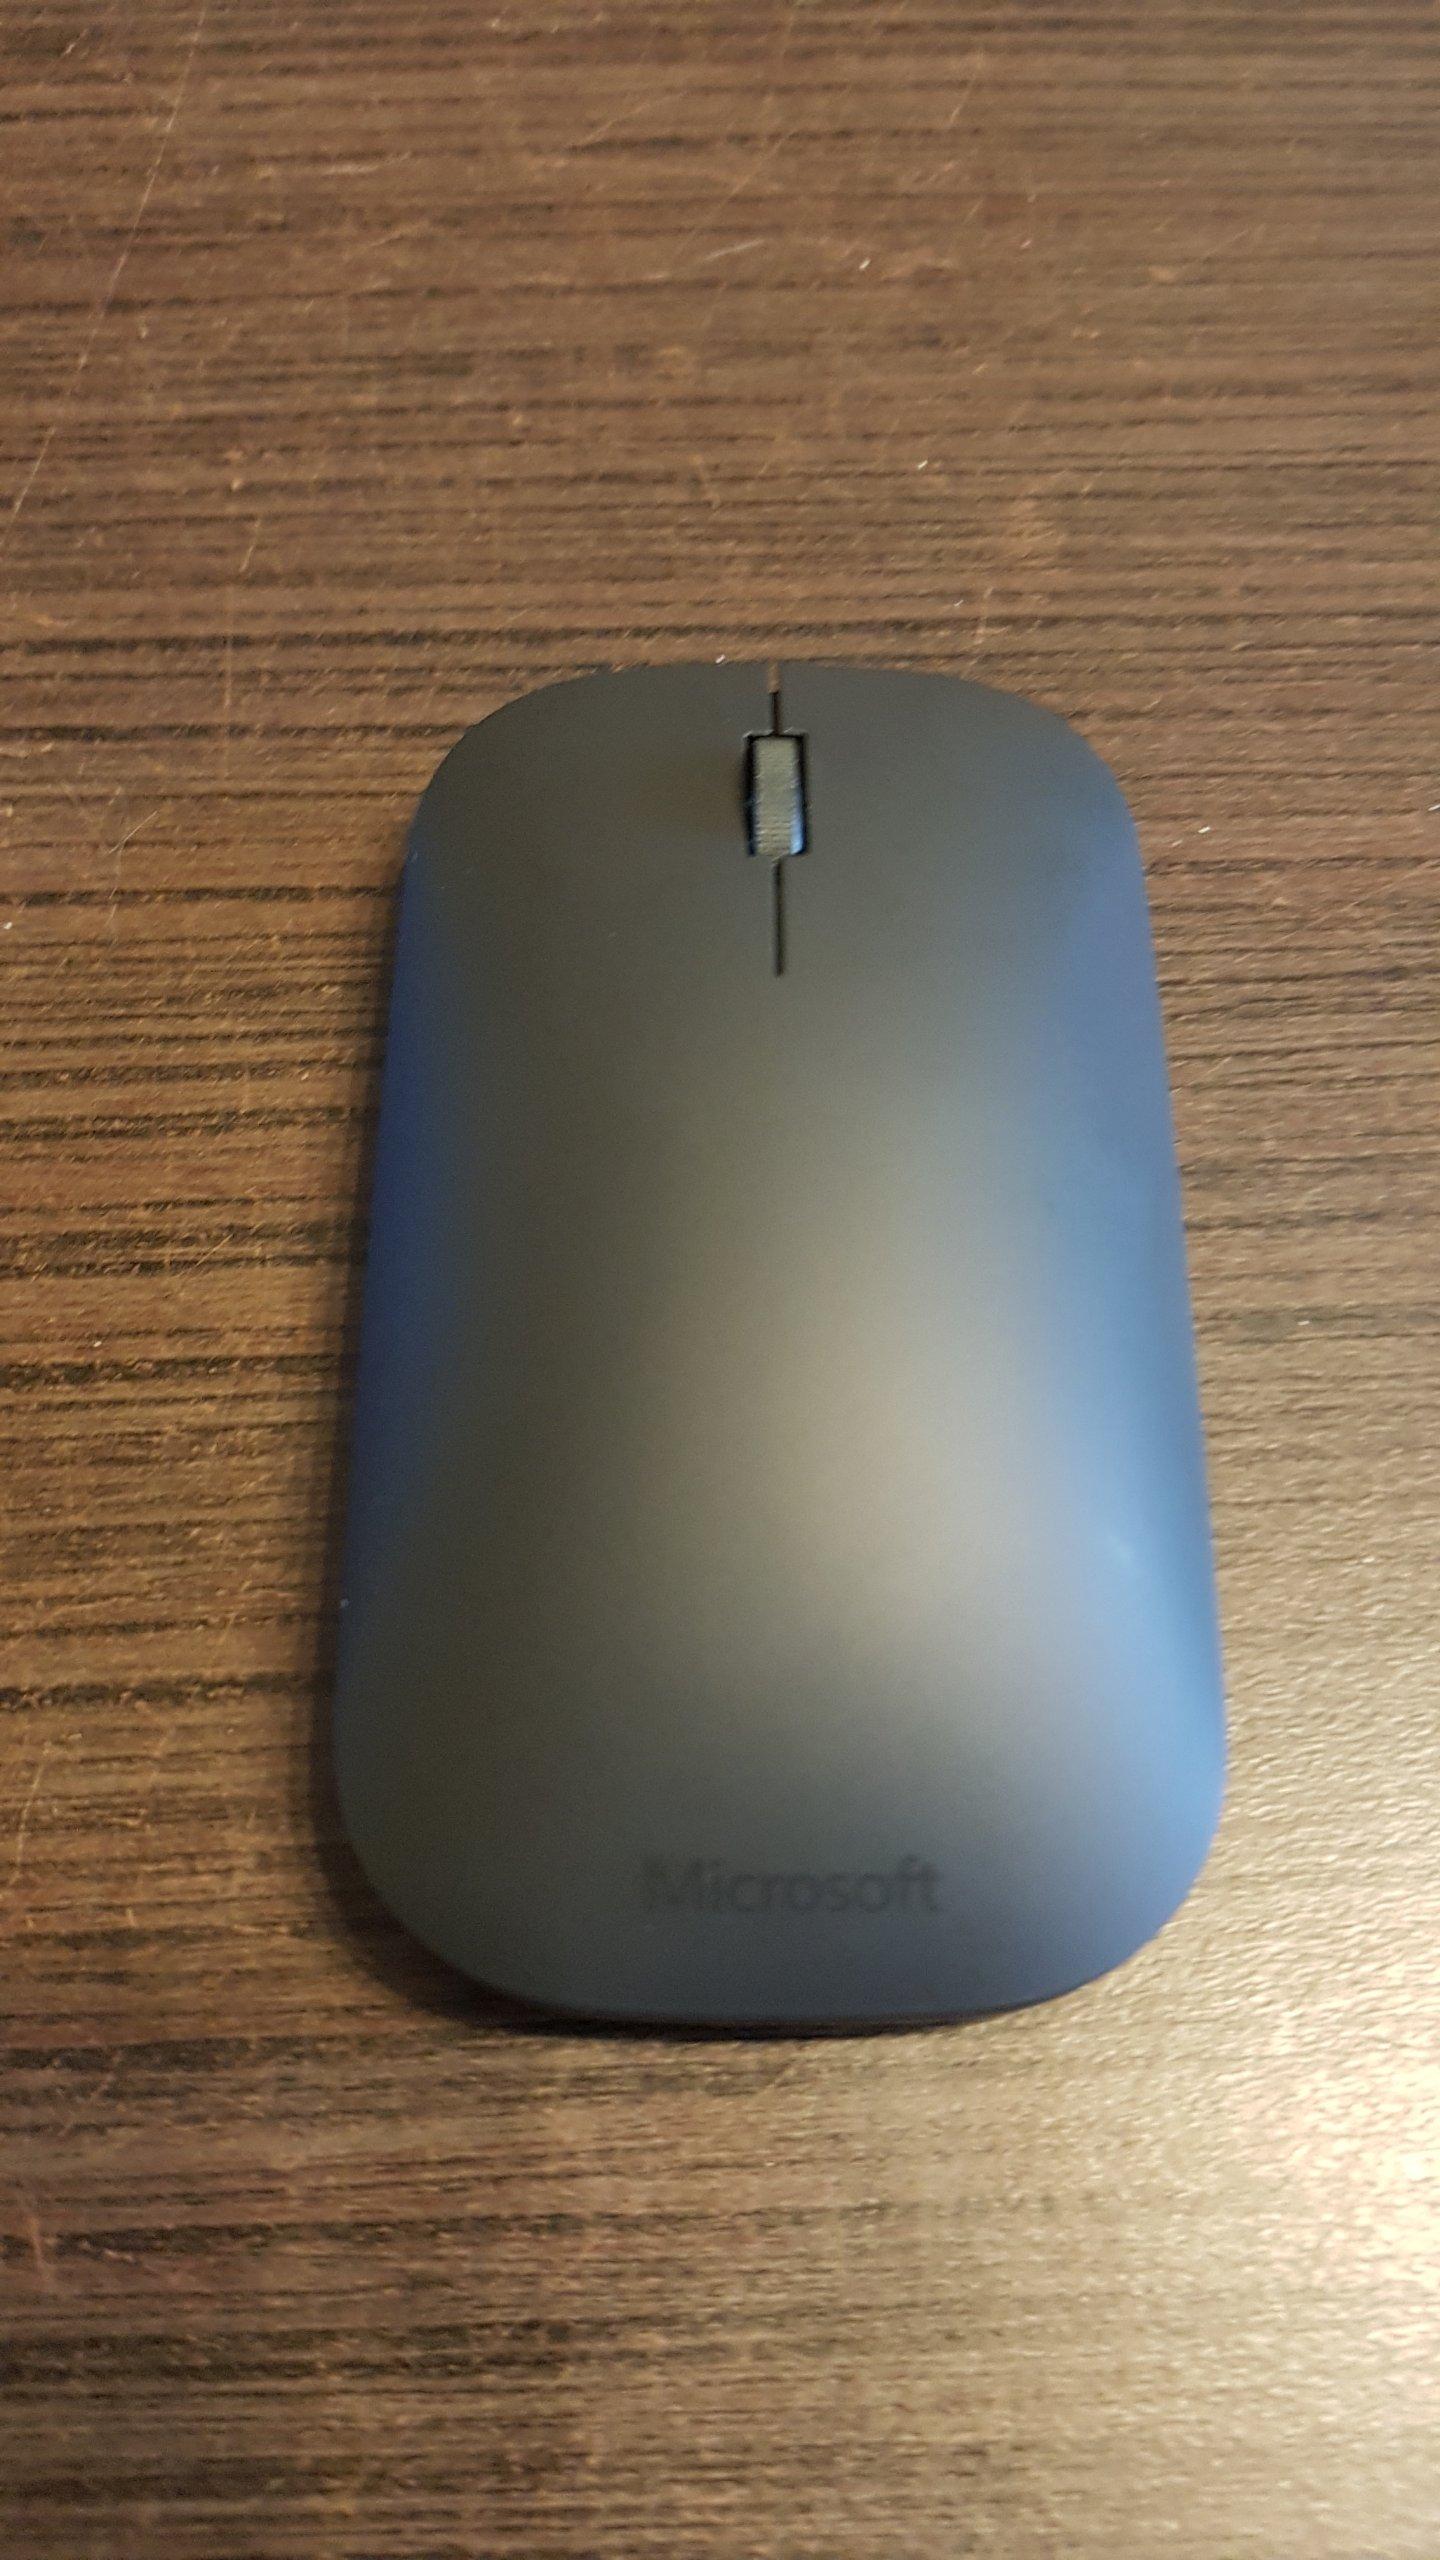 Microsoft Designer Bluetooth Mouse Bcm 7022985795 Oficjalne